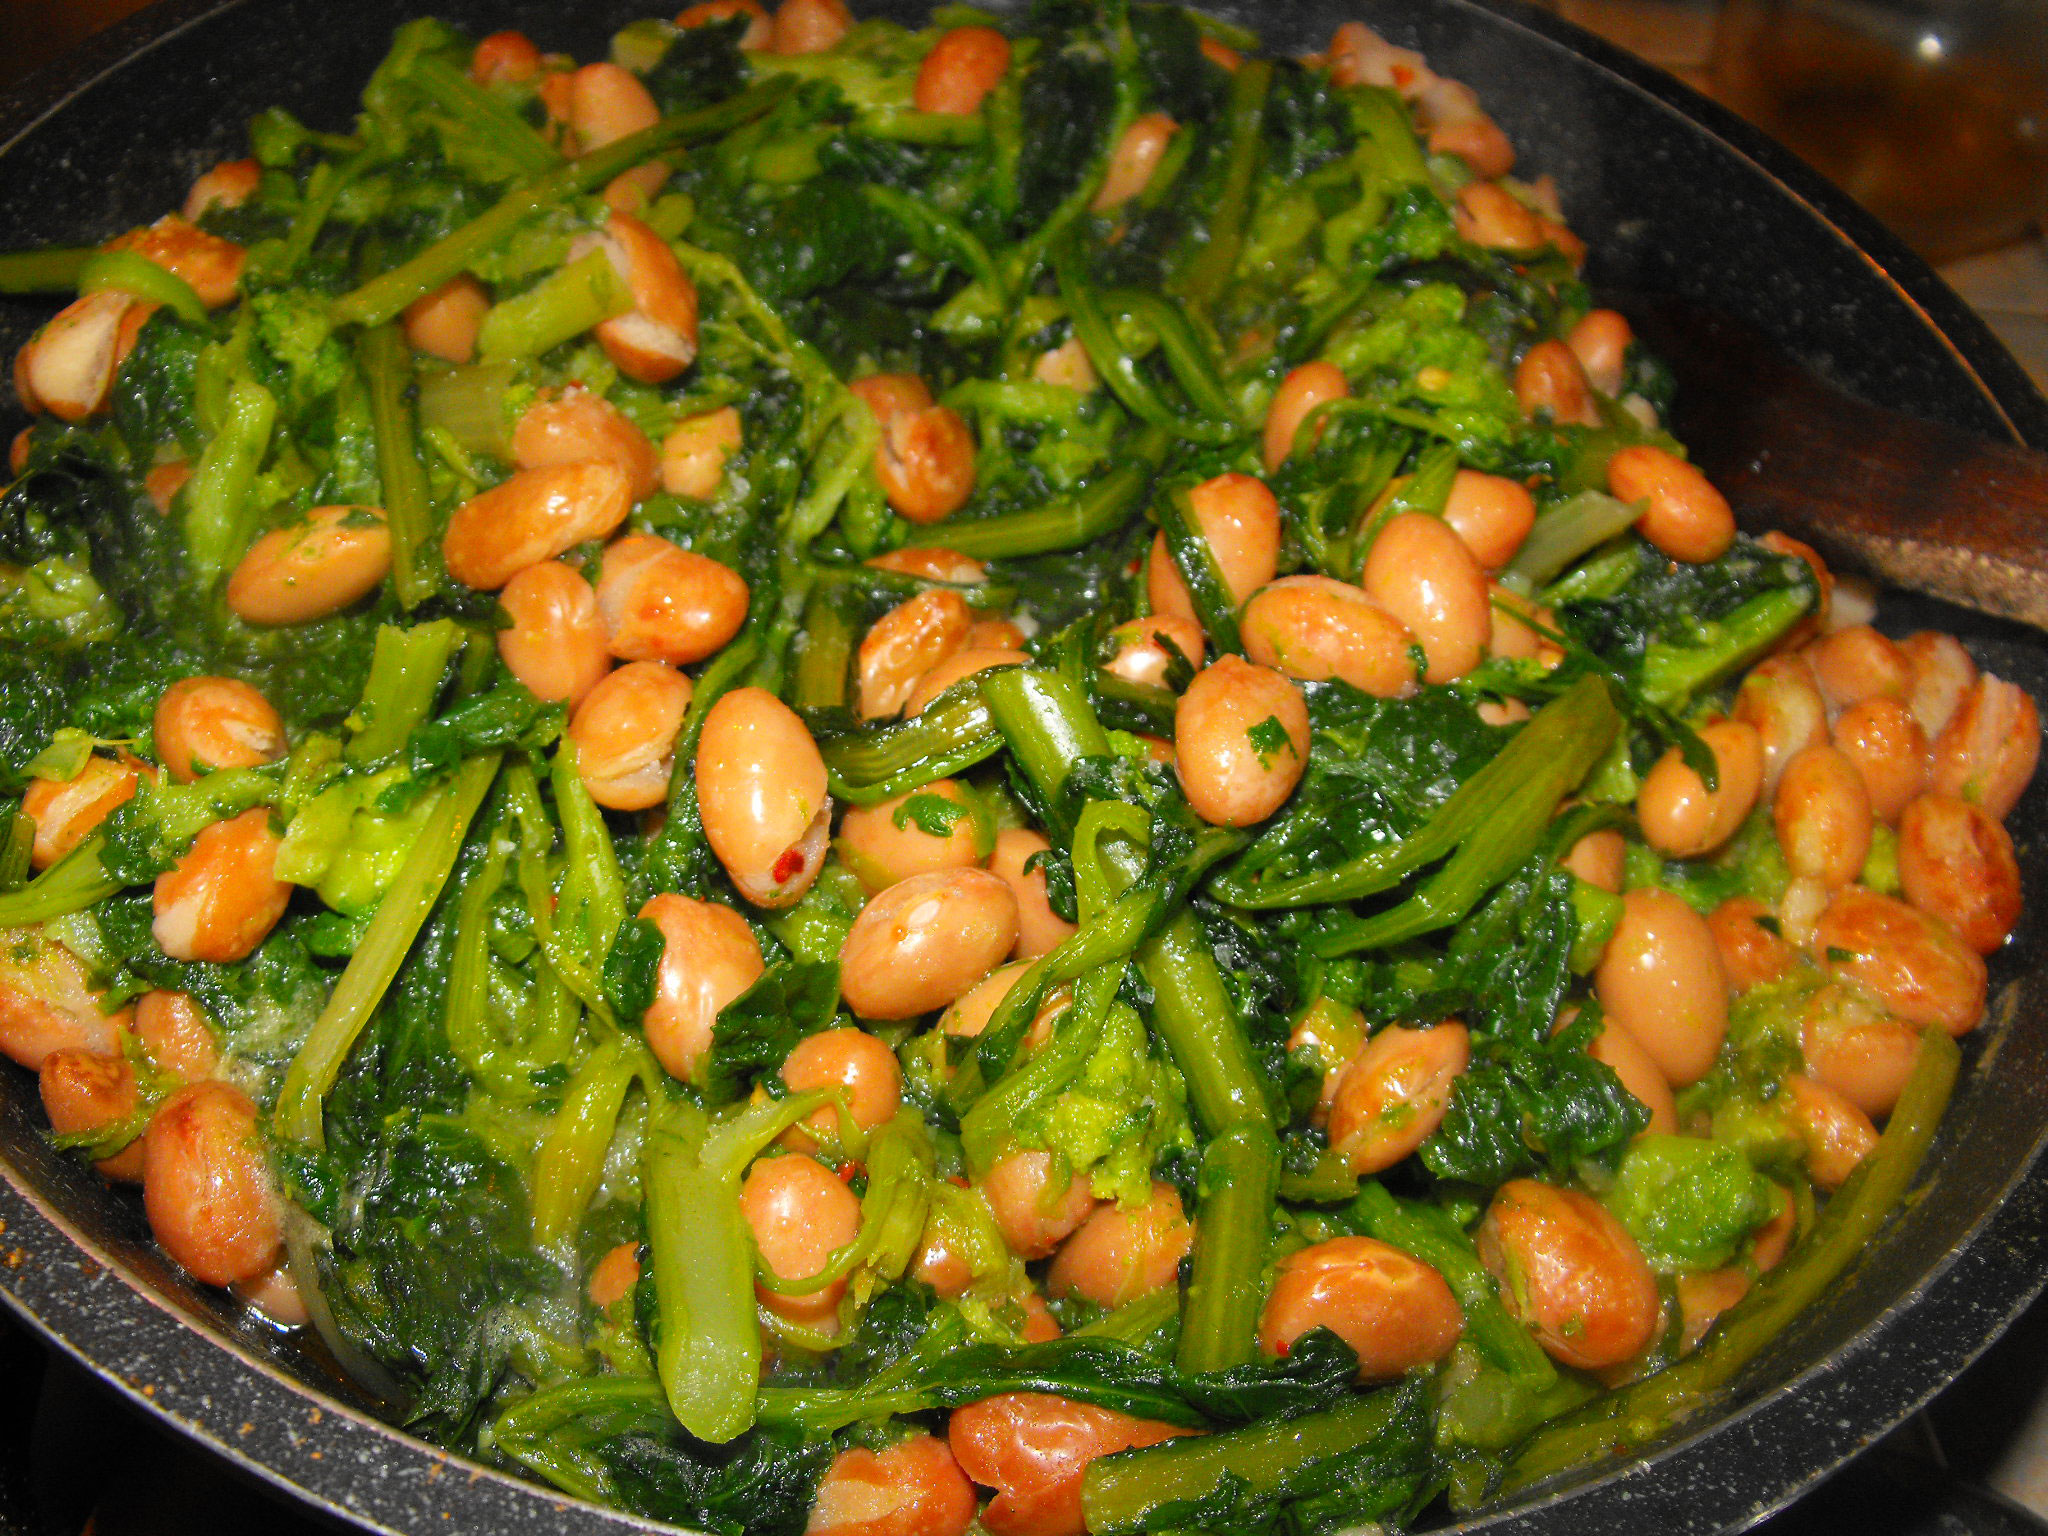 Rape e fagioli, Turnip greens and beans, Nabos con judías, Ruben und Bohnen, Navets et haricots